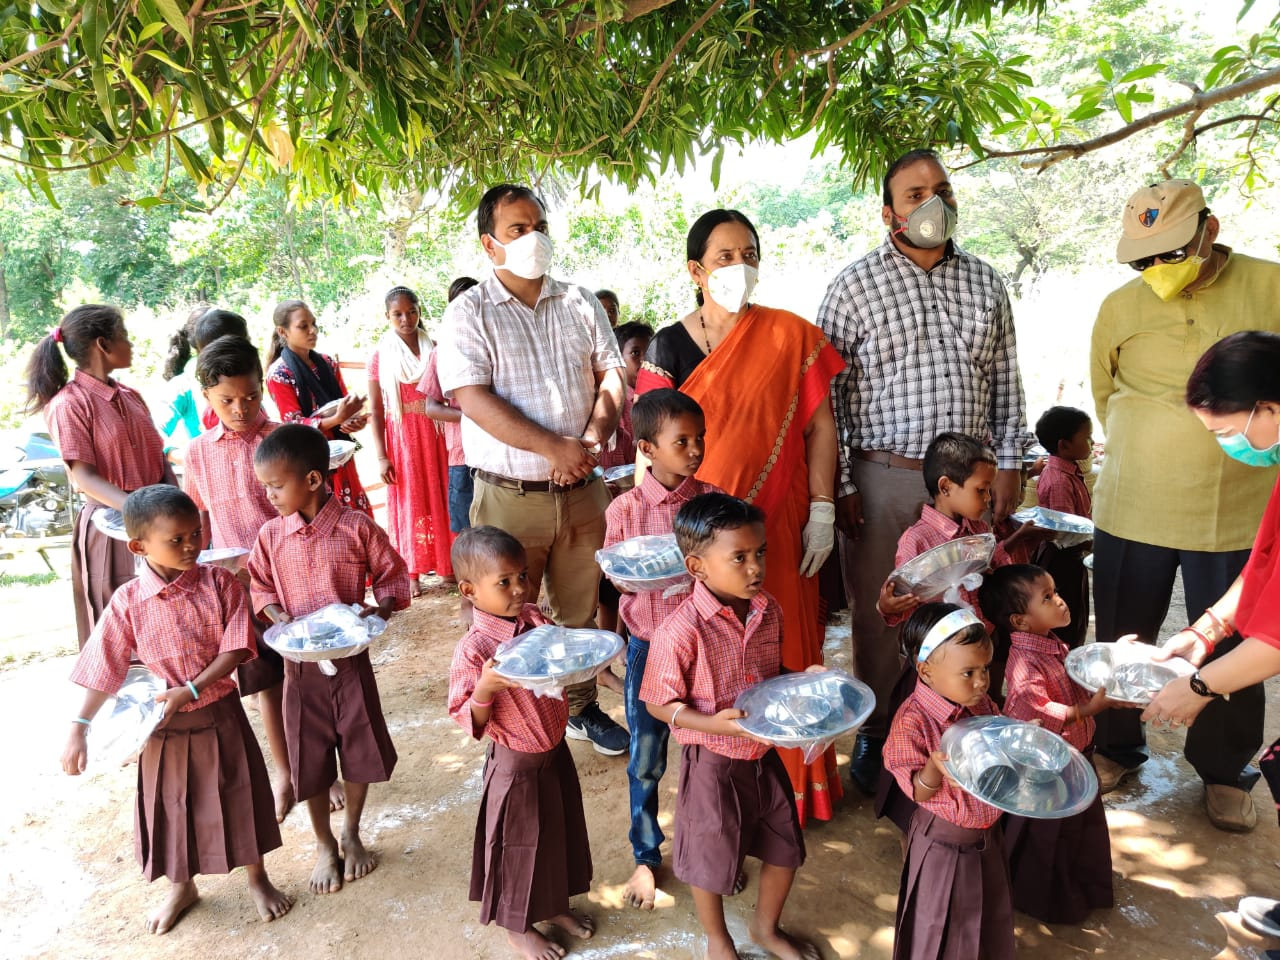 Food being served to Sabar children at a village in Saraikela-Kharsawan district as part of the Palash ke Phool initiative